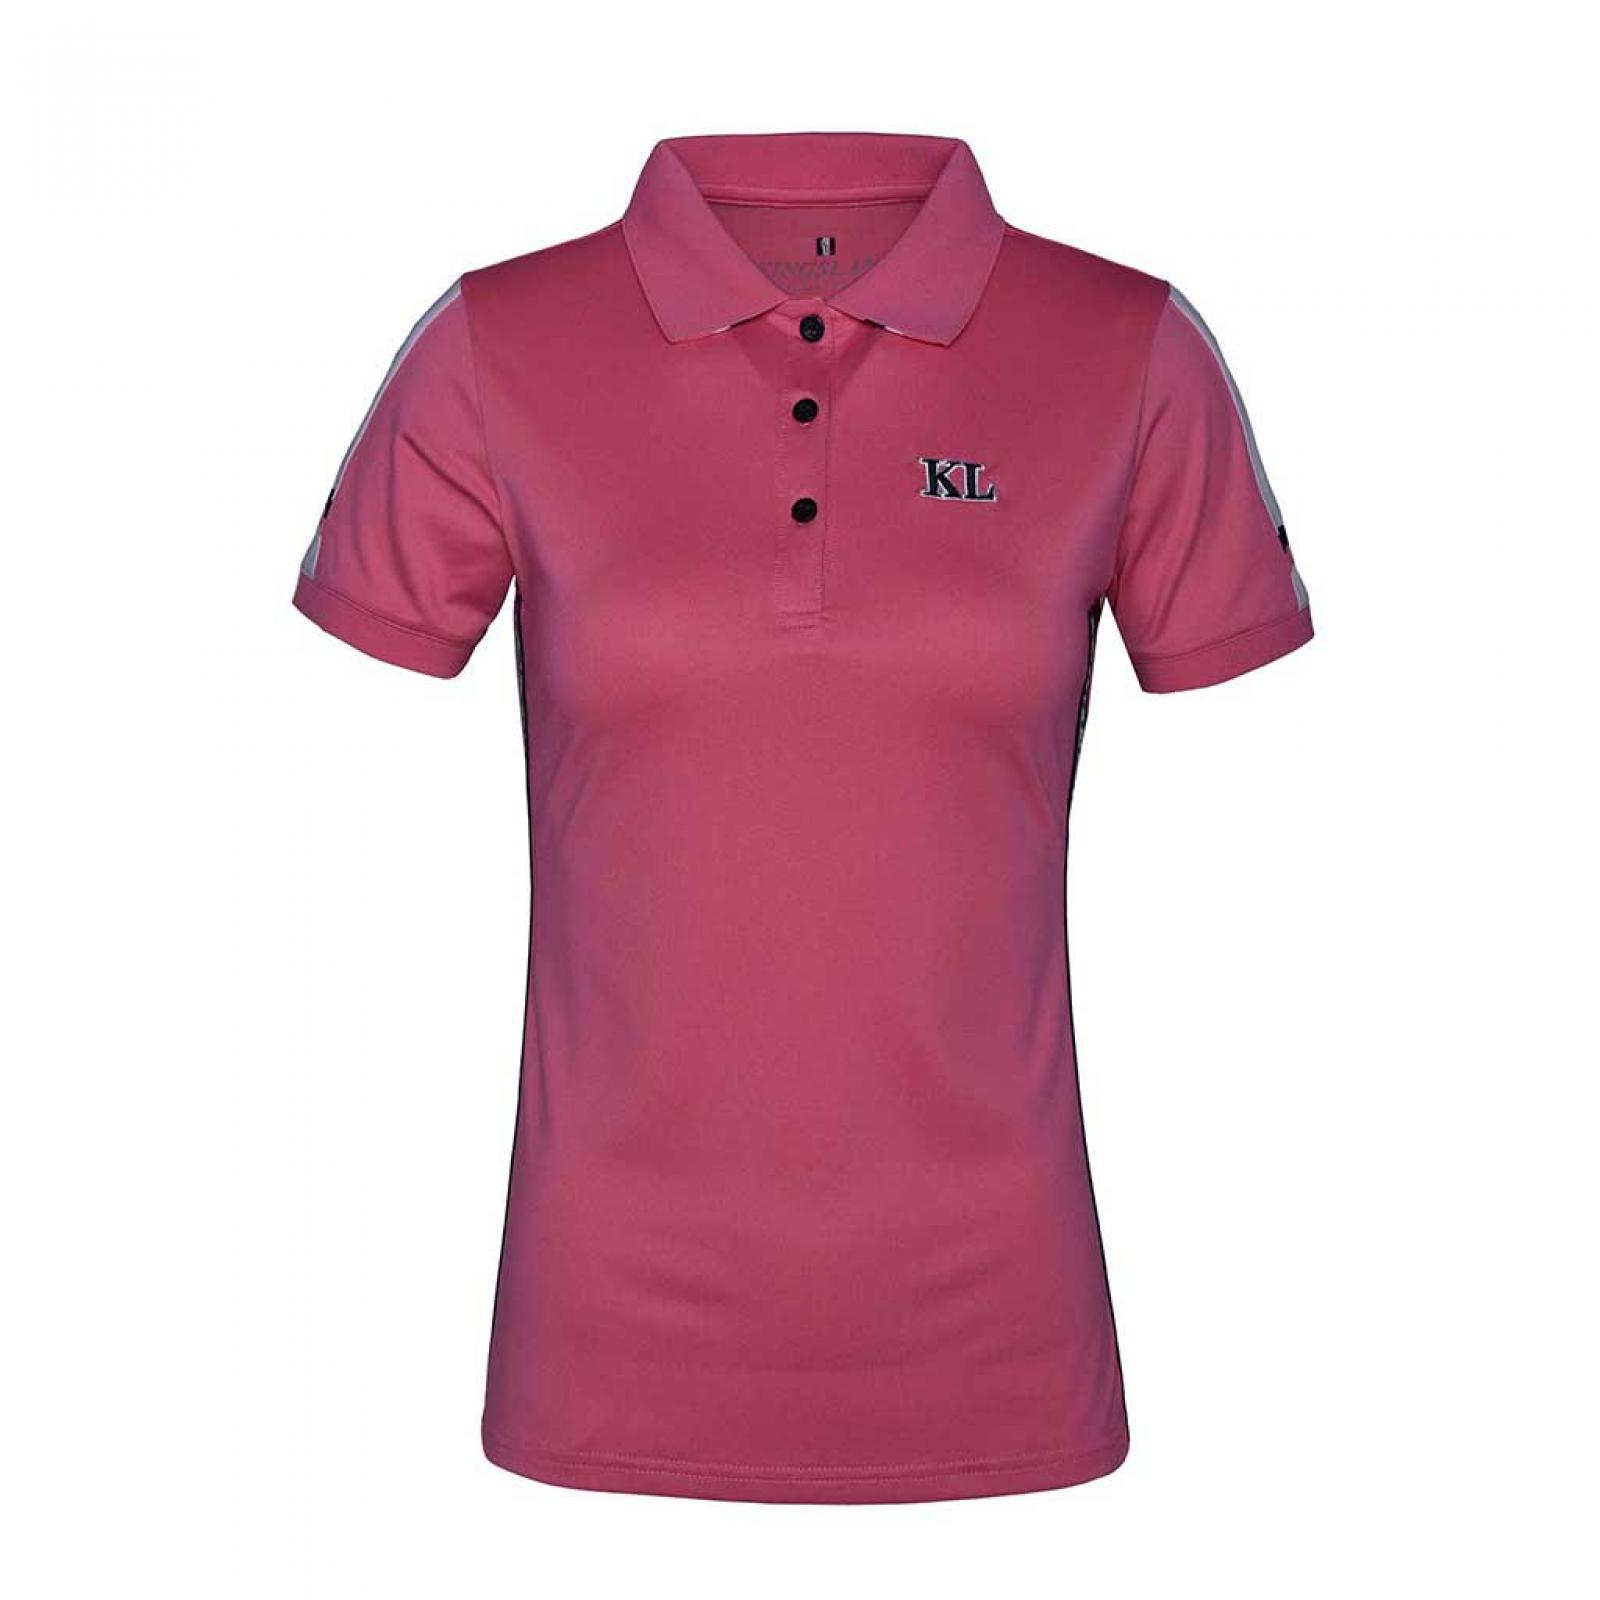 Kingsland Uma Ladies Tec Micro Pique Polo Shirt Top